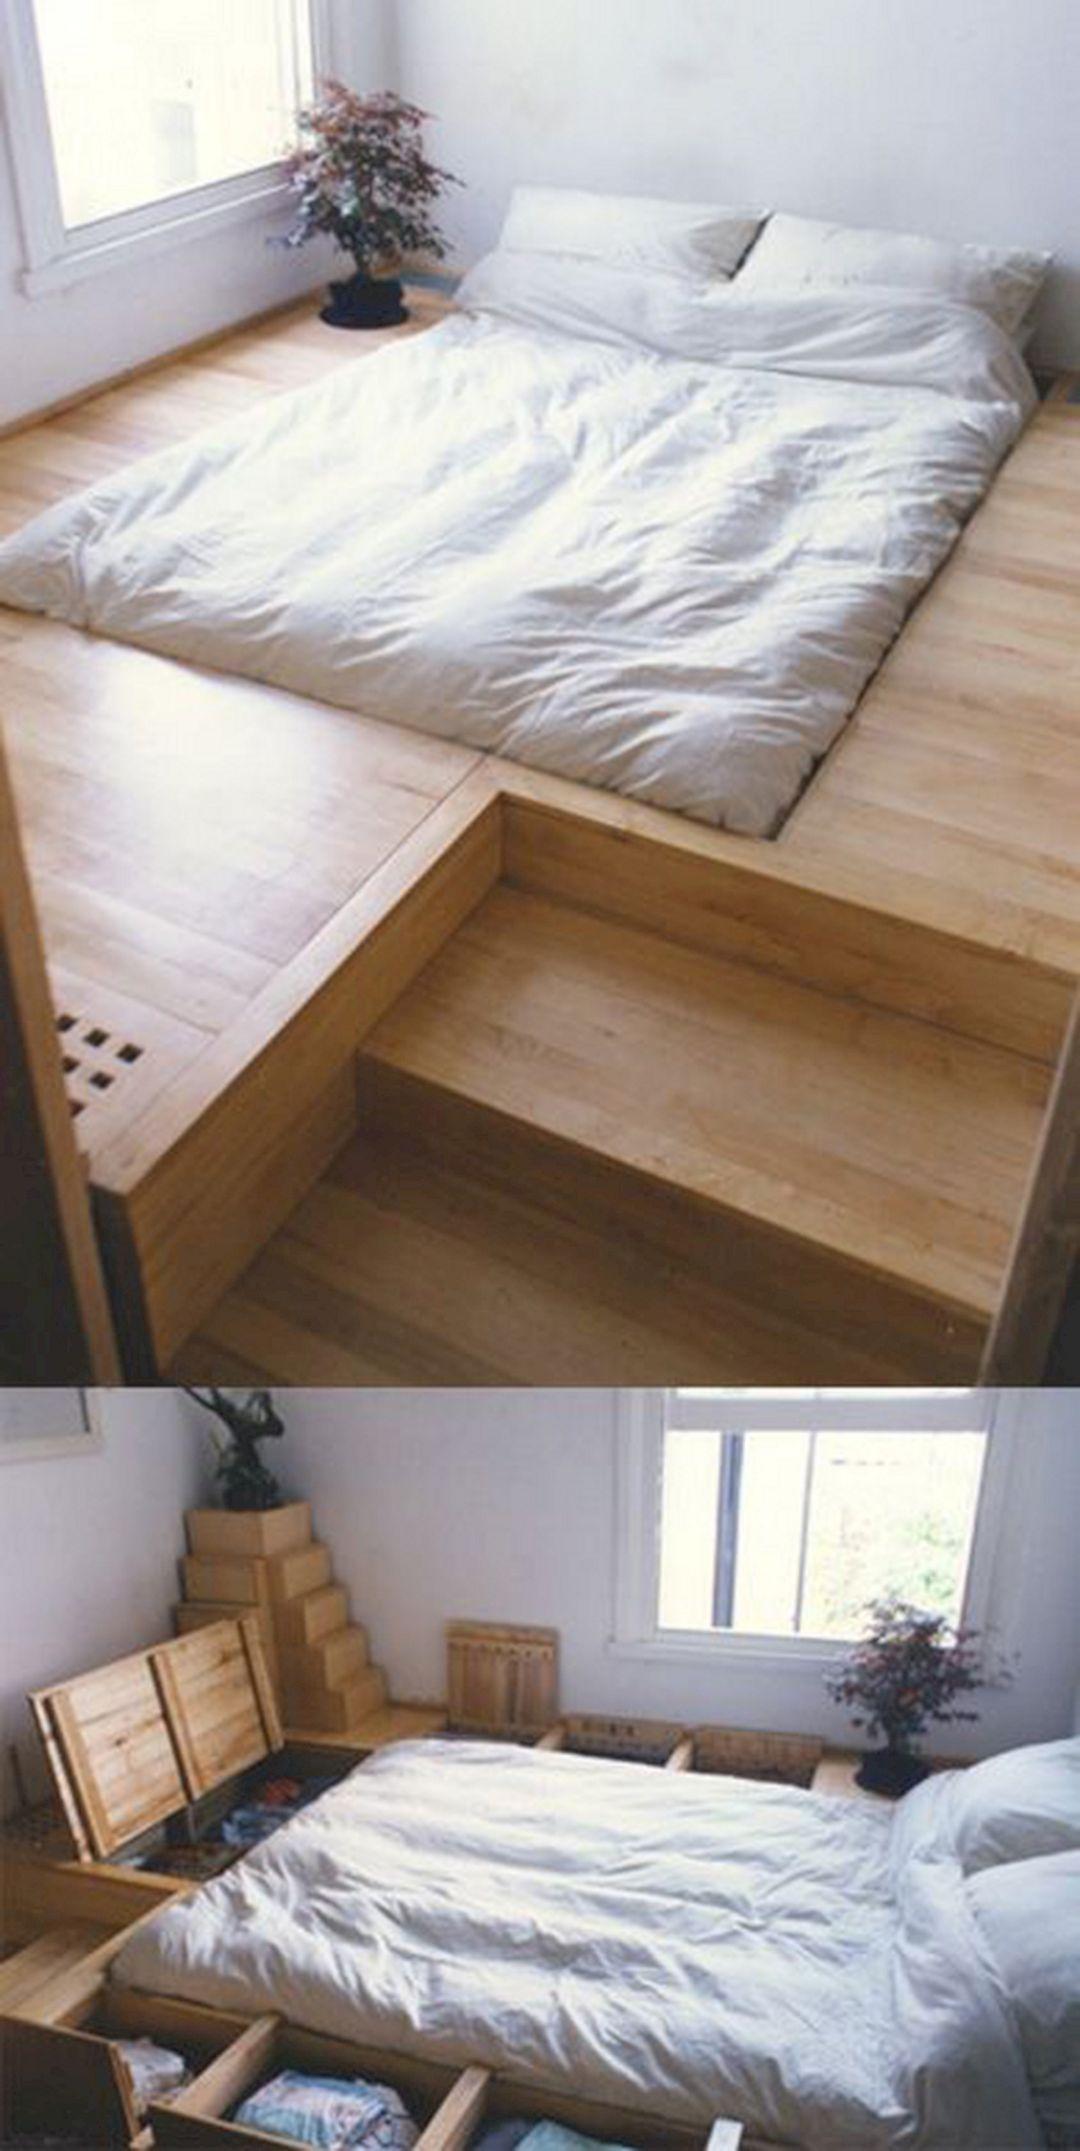 Top 20 Top Hidden Shelving Design Ideas For Bedroom Httpsdecorathingcom